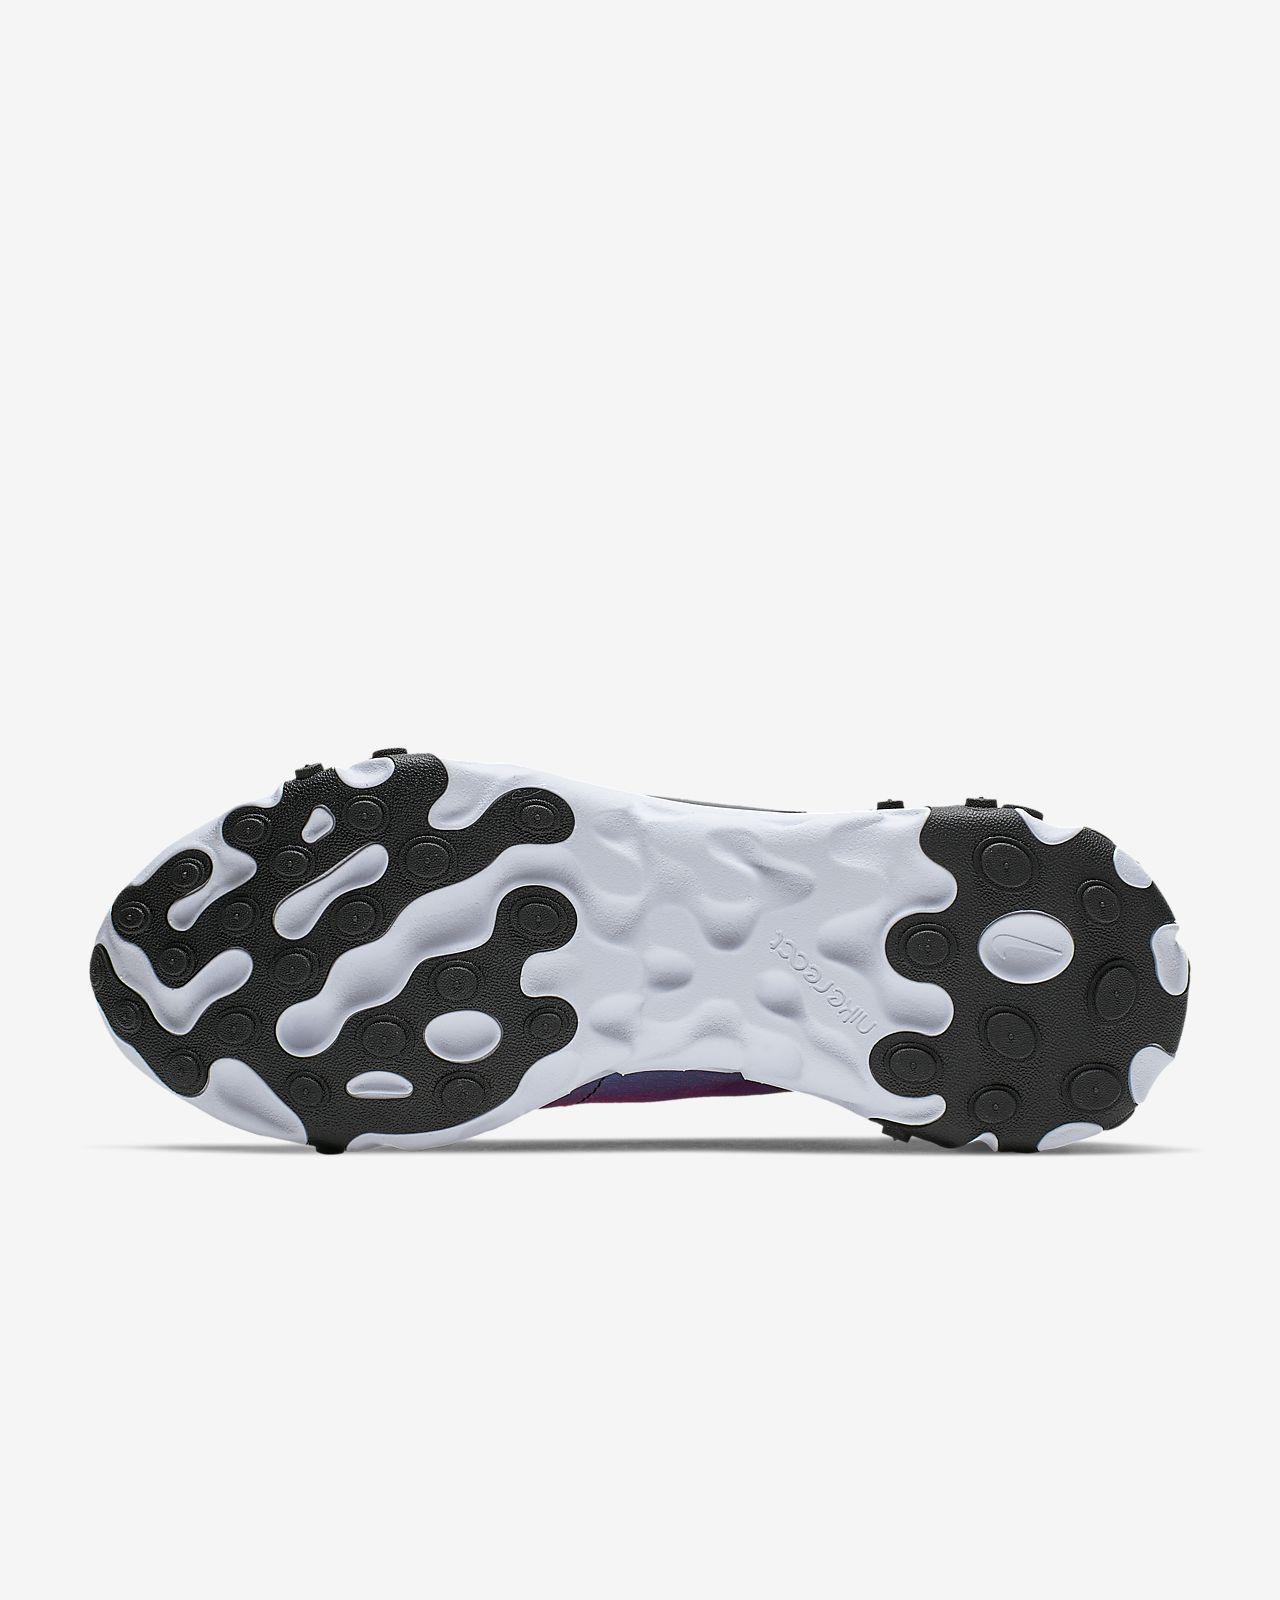 Nike Pour FemmeBe Chaussure React Element Premium 55 54L3AScRqj